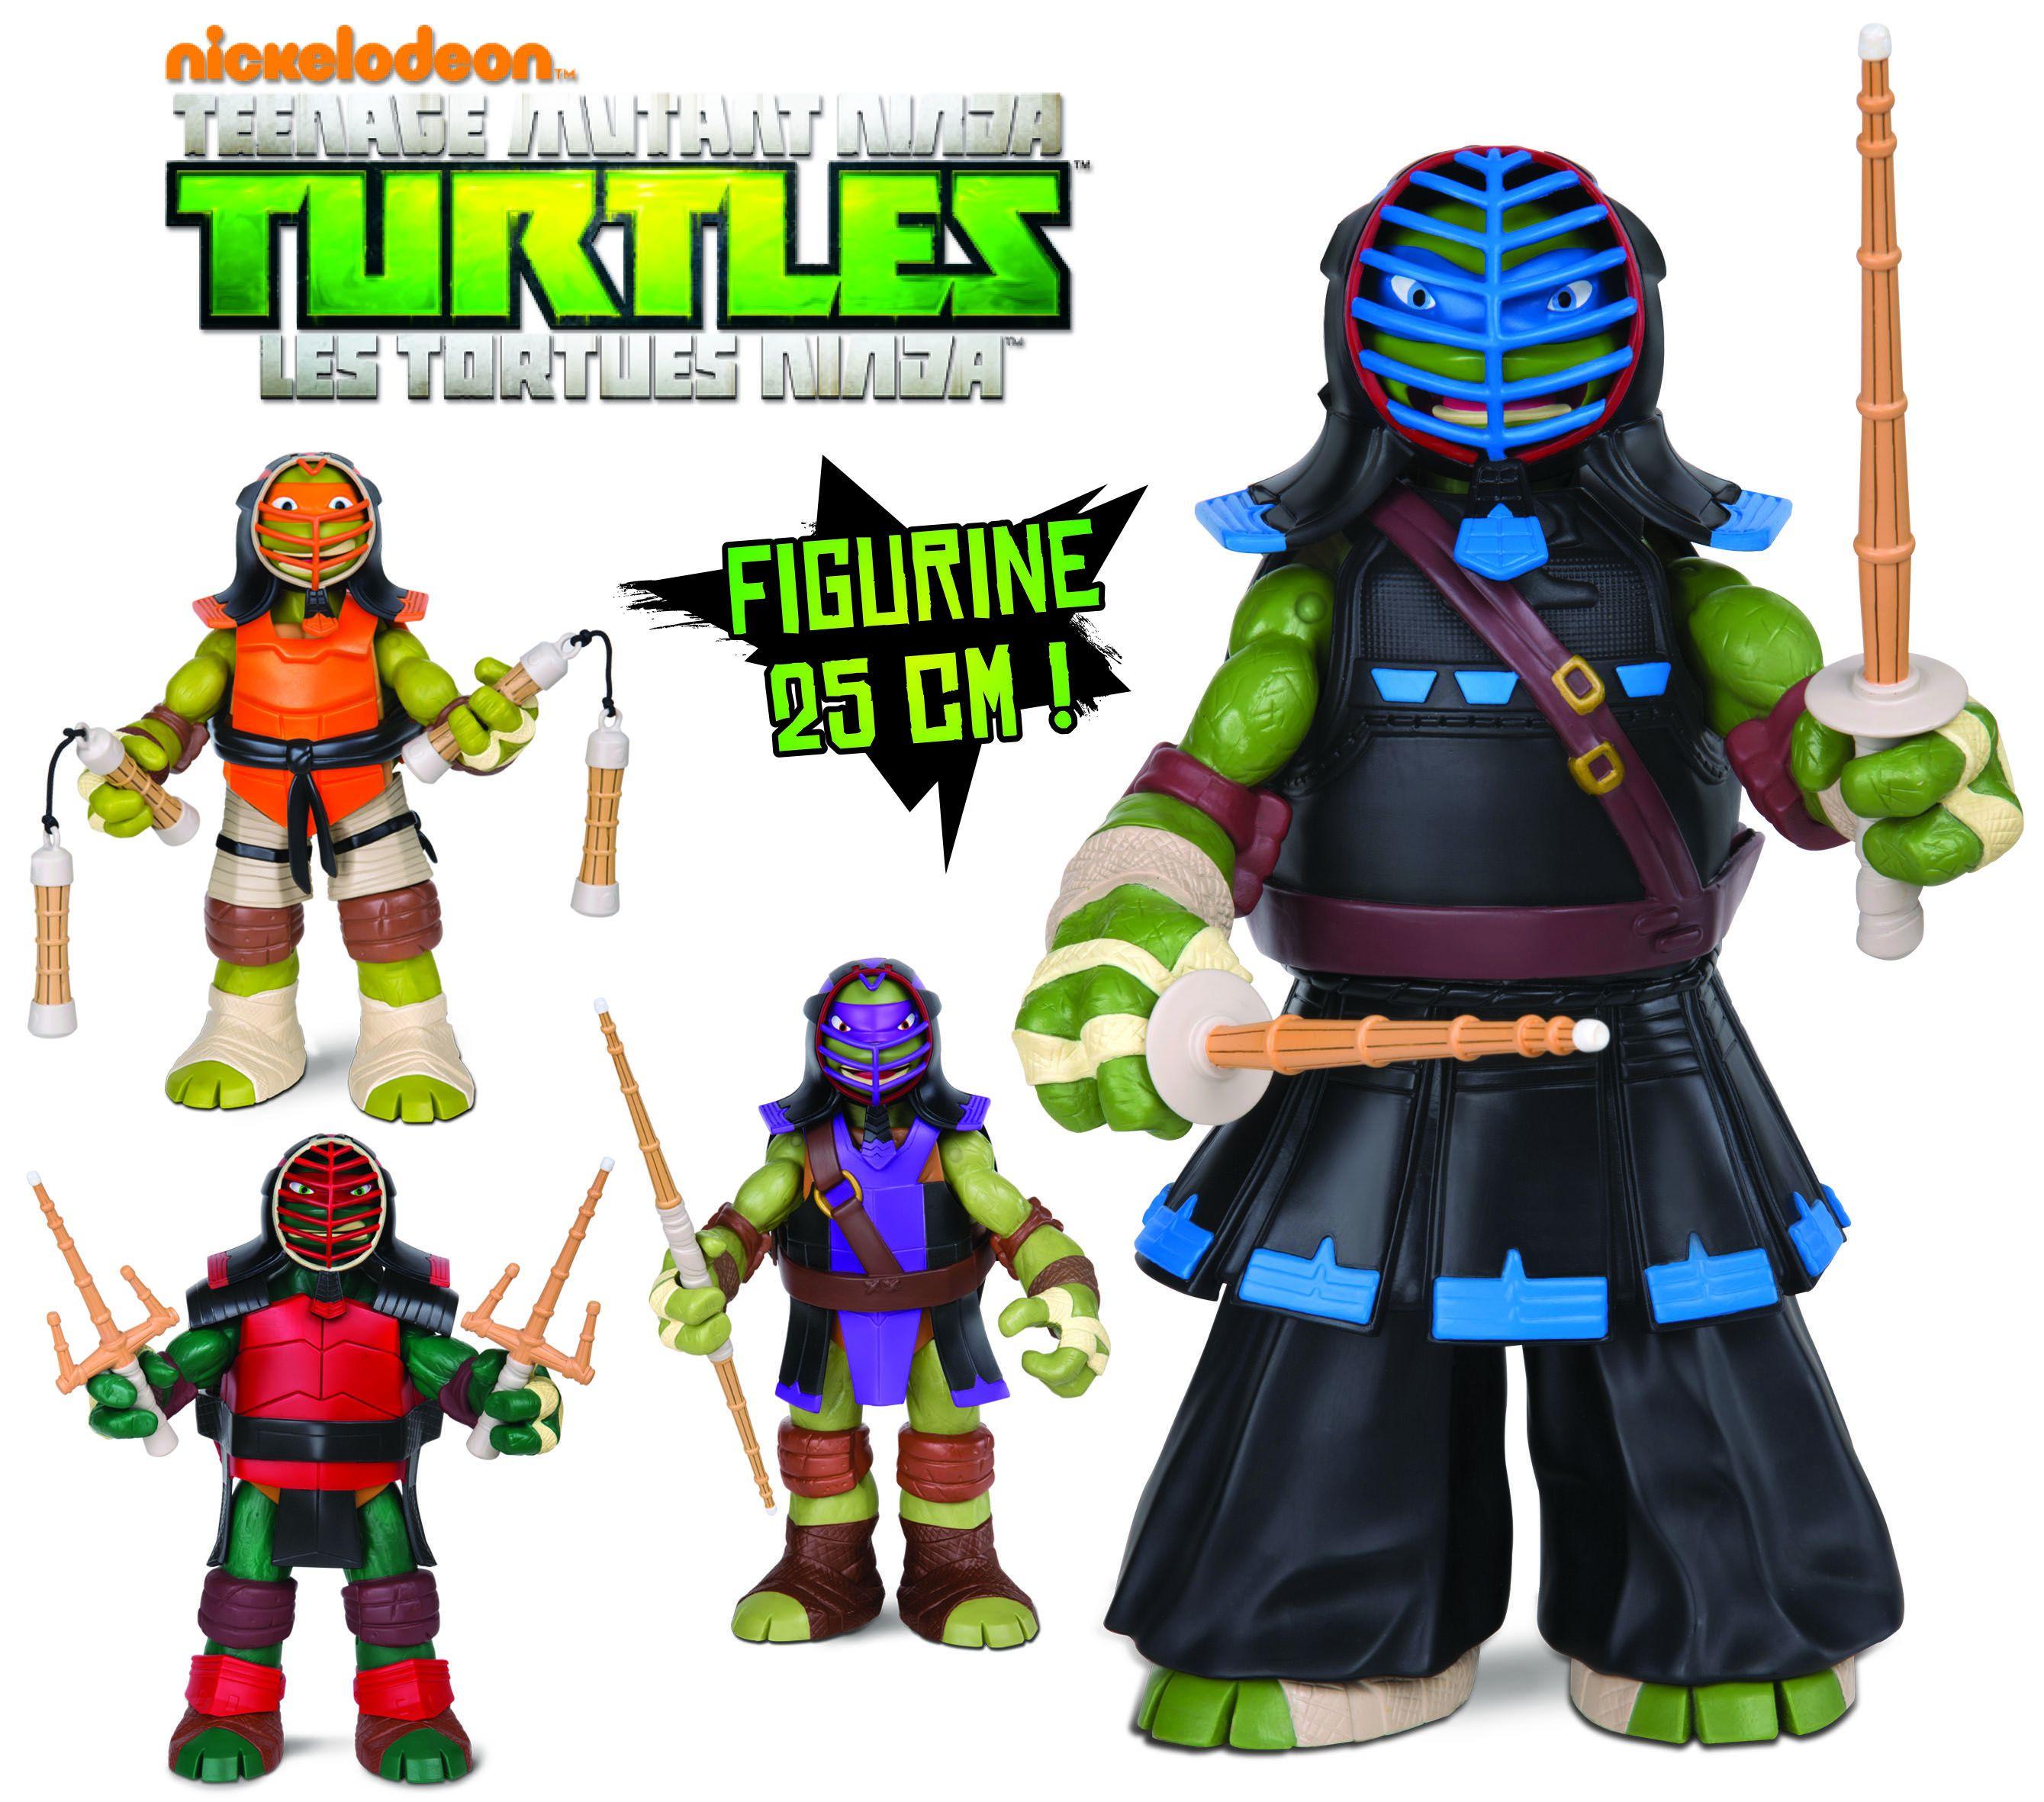 Tortues ninja figurine articul e leonardo 25 cm achat vente figurine personnage cdiscount - Leonardo tortues ninja ...